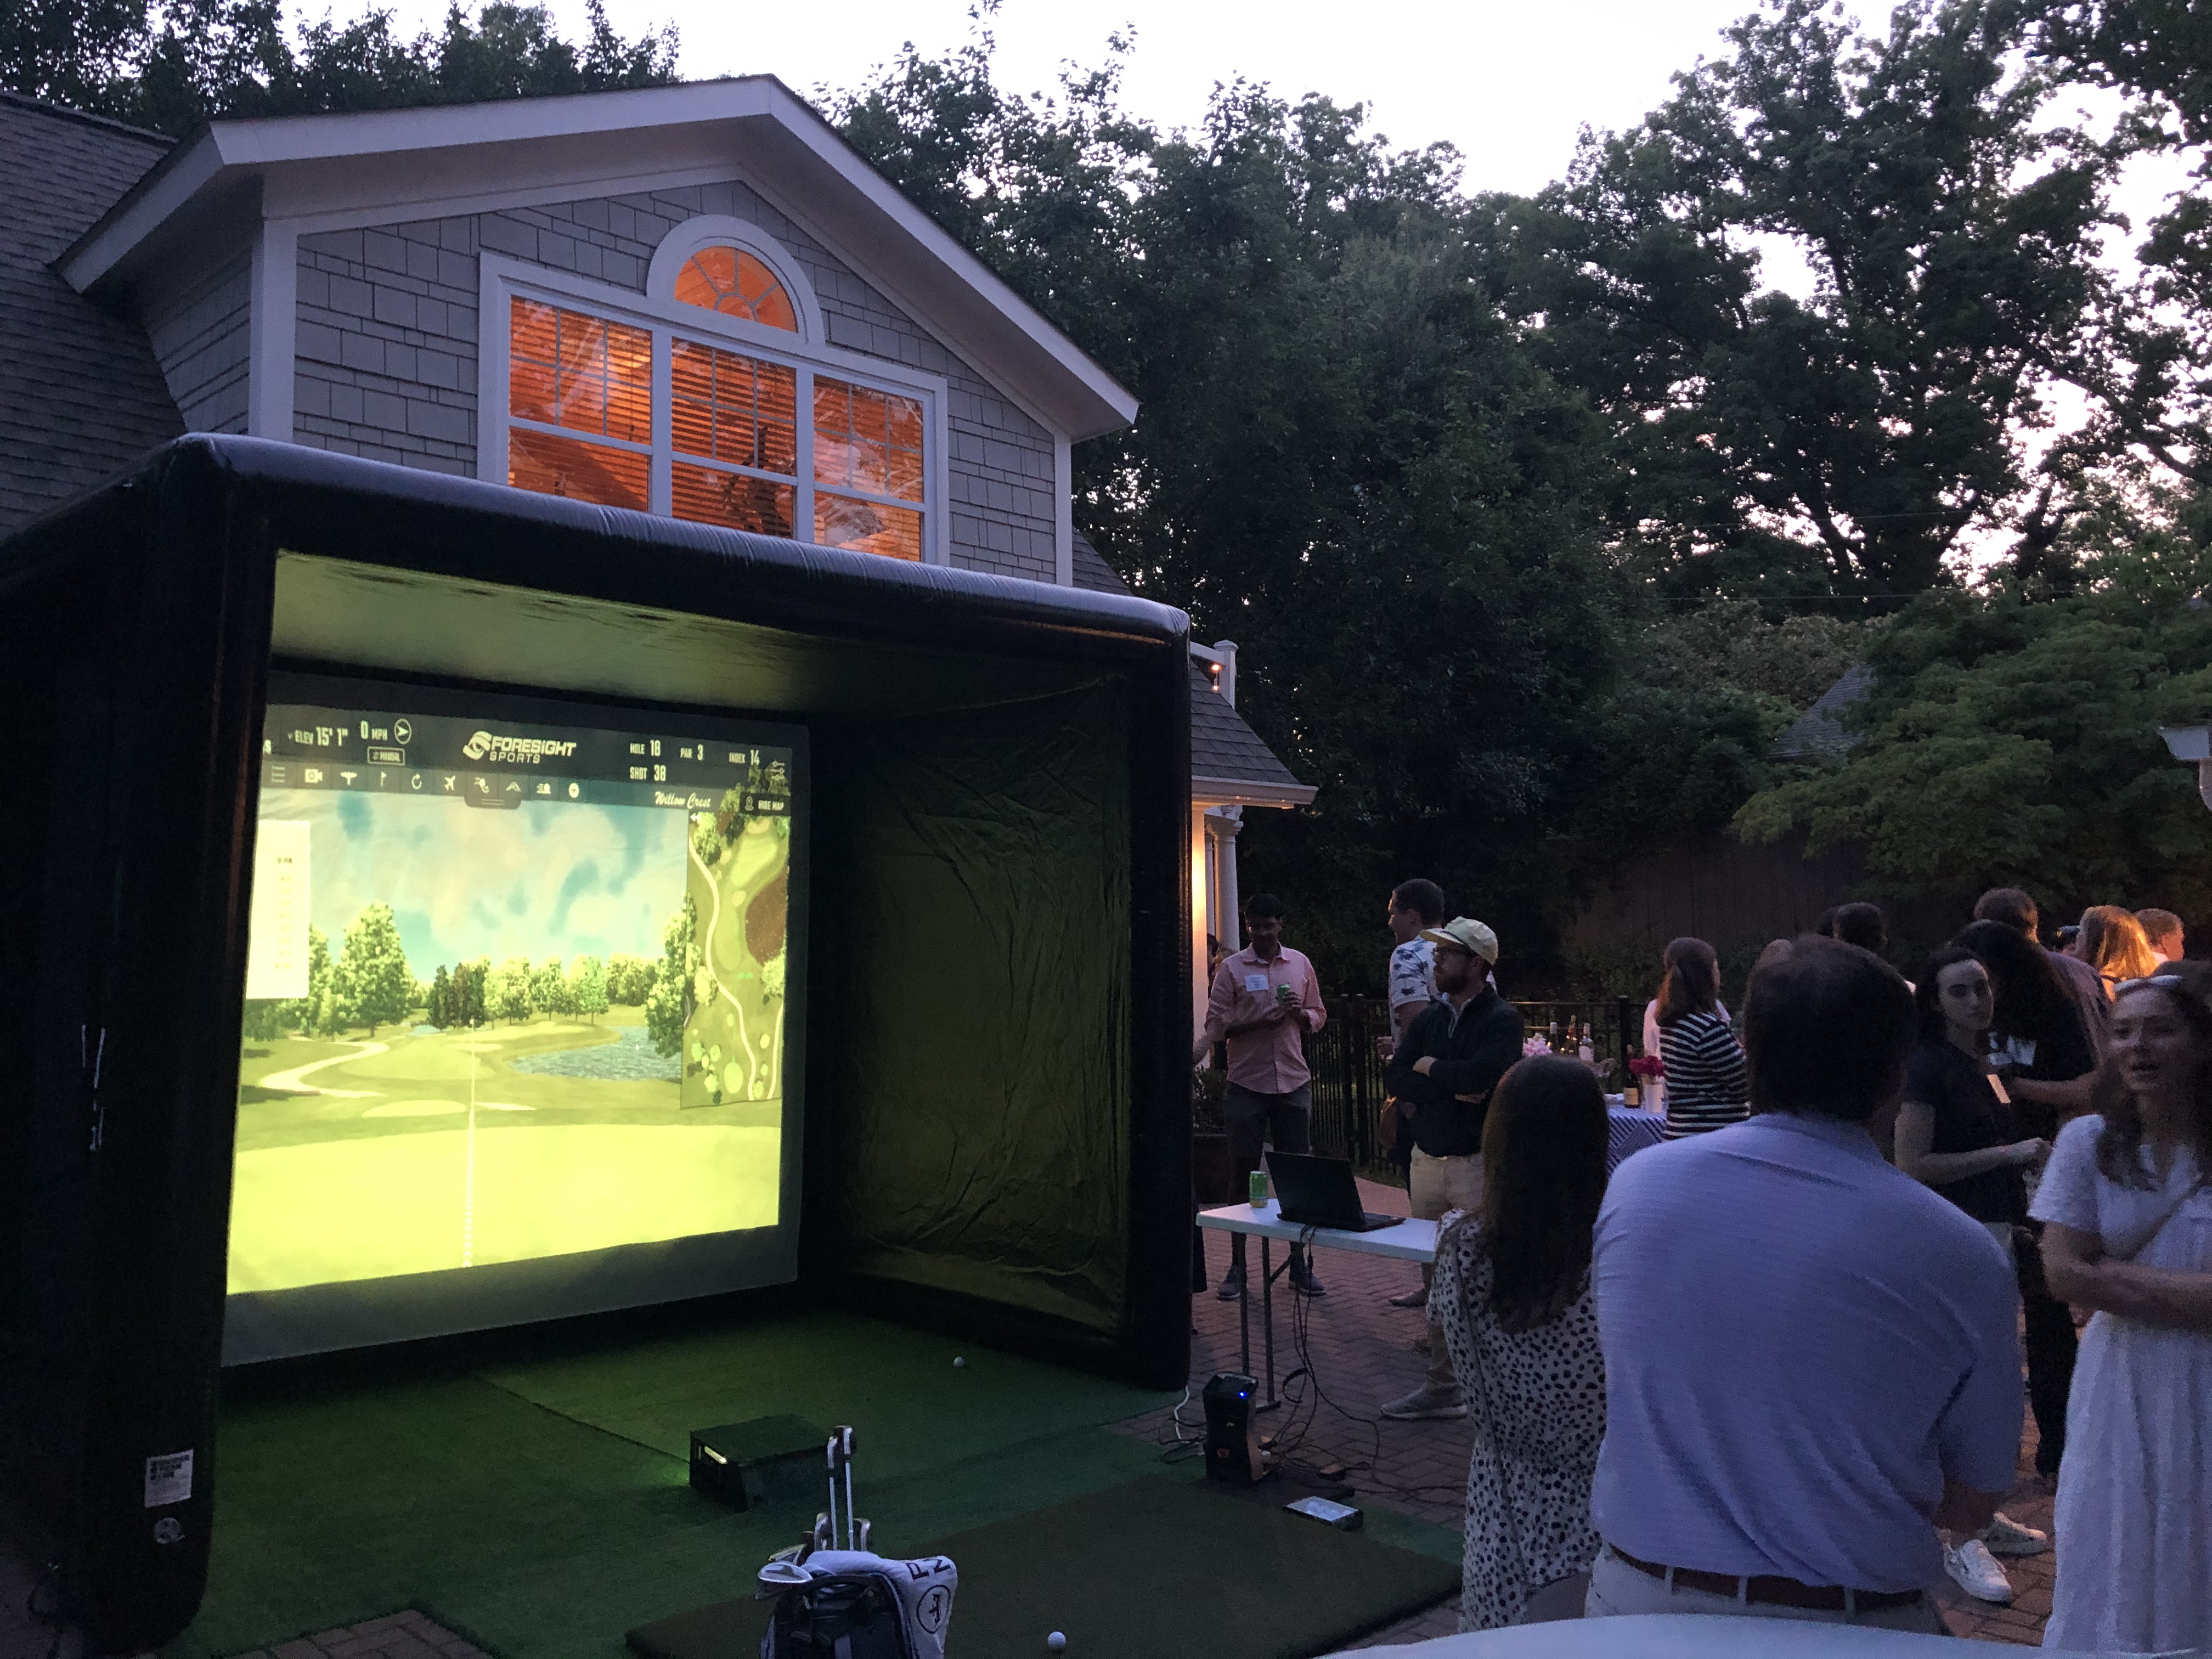 The Best Golf Simulators Rentals in Raleigh